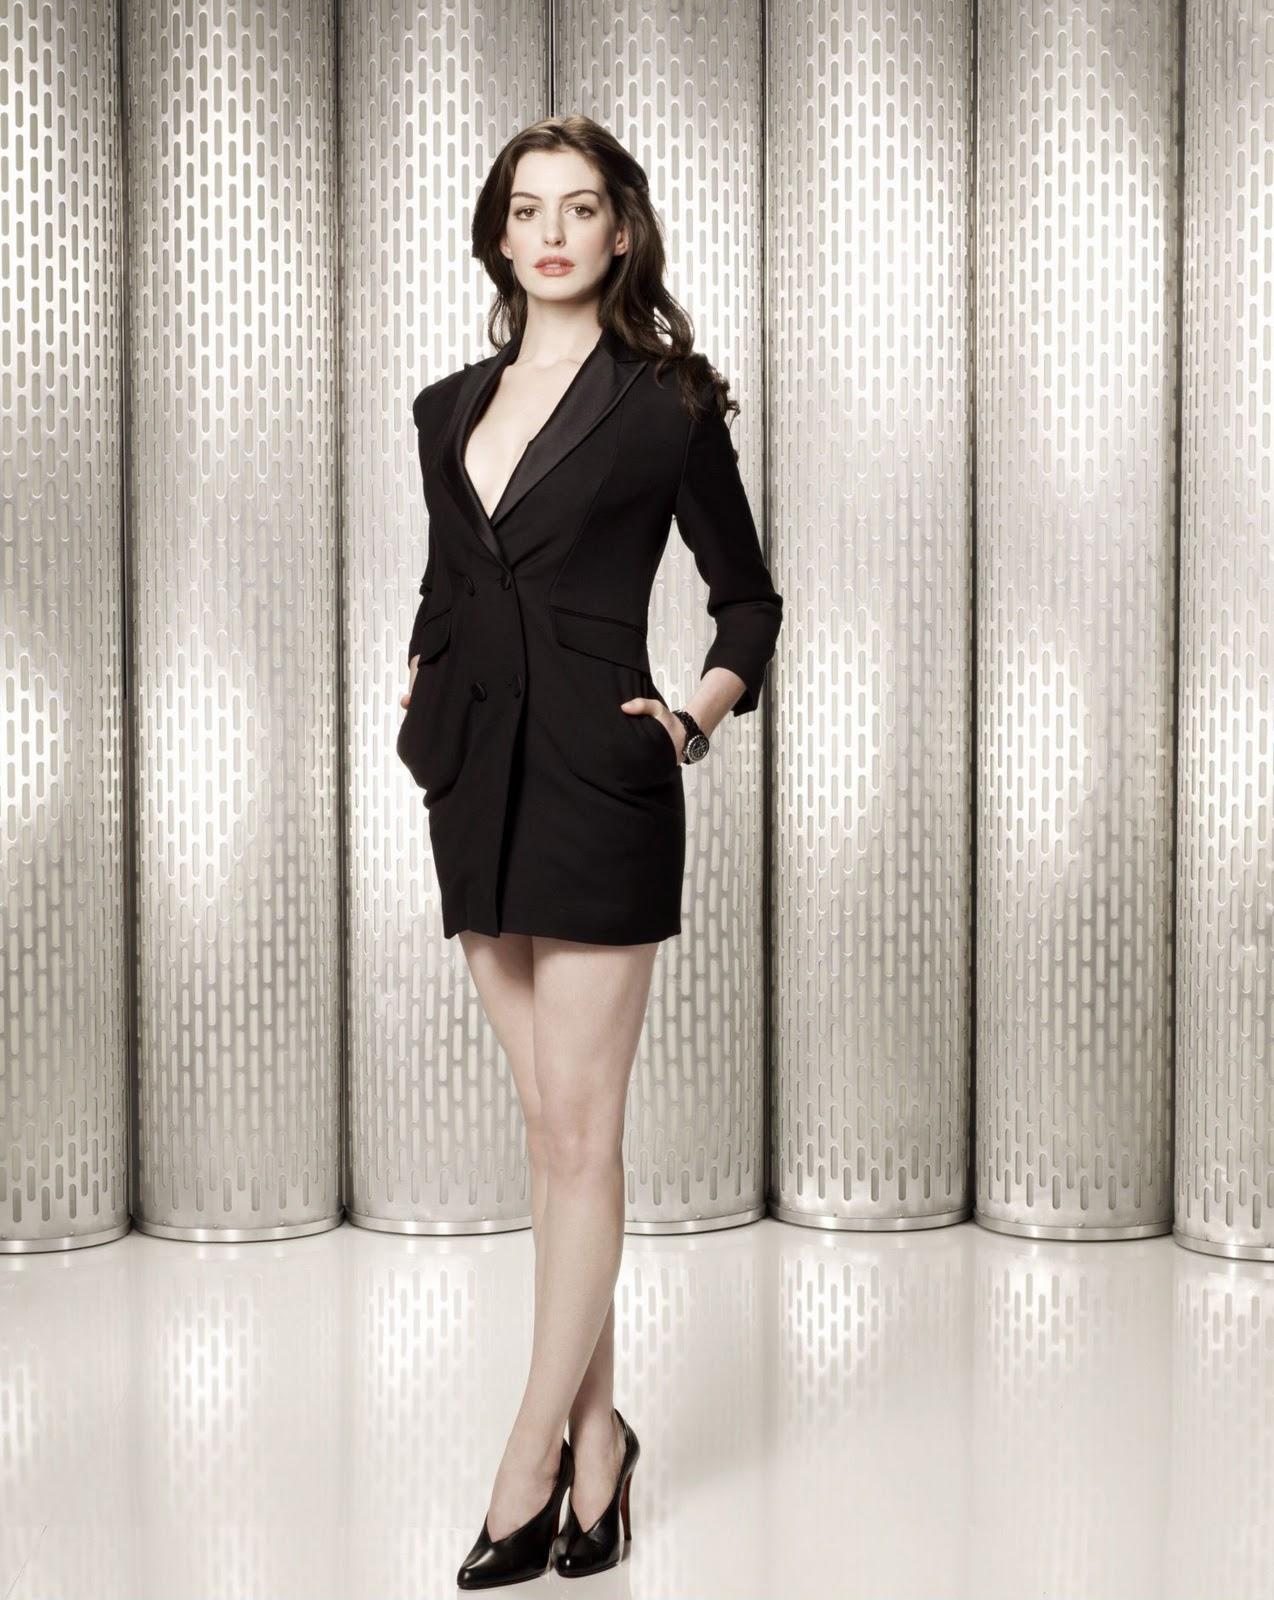 http://3.bp.blogspot.com/-hYgZoVZ_Q1M/Tw8sHSeEybI/AAAAAAAAJdg/F-rucmRU1Yo/s1600/Anne+Hathaway+-+Get+Smart+-+Promo+Photo+a10.jpg